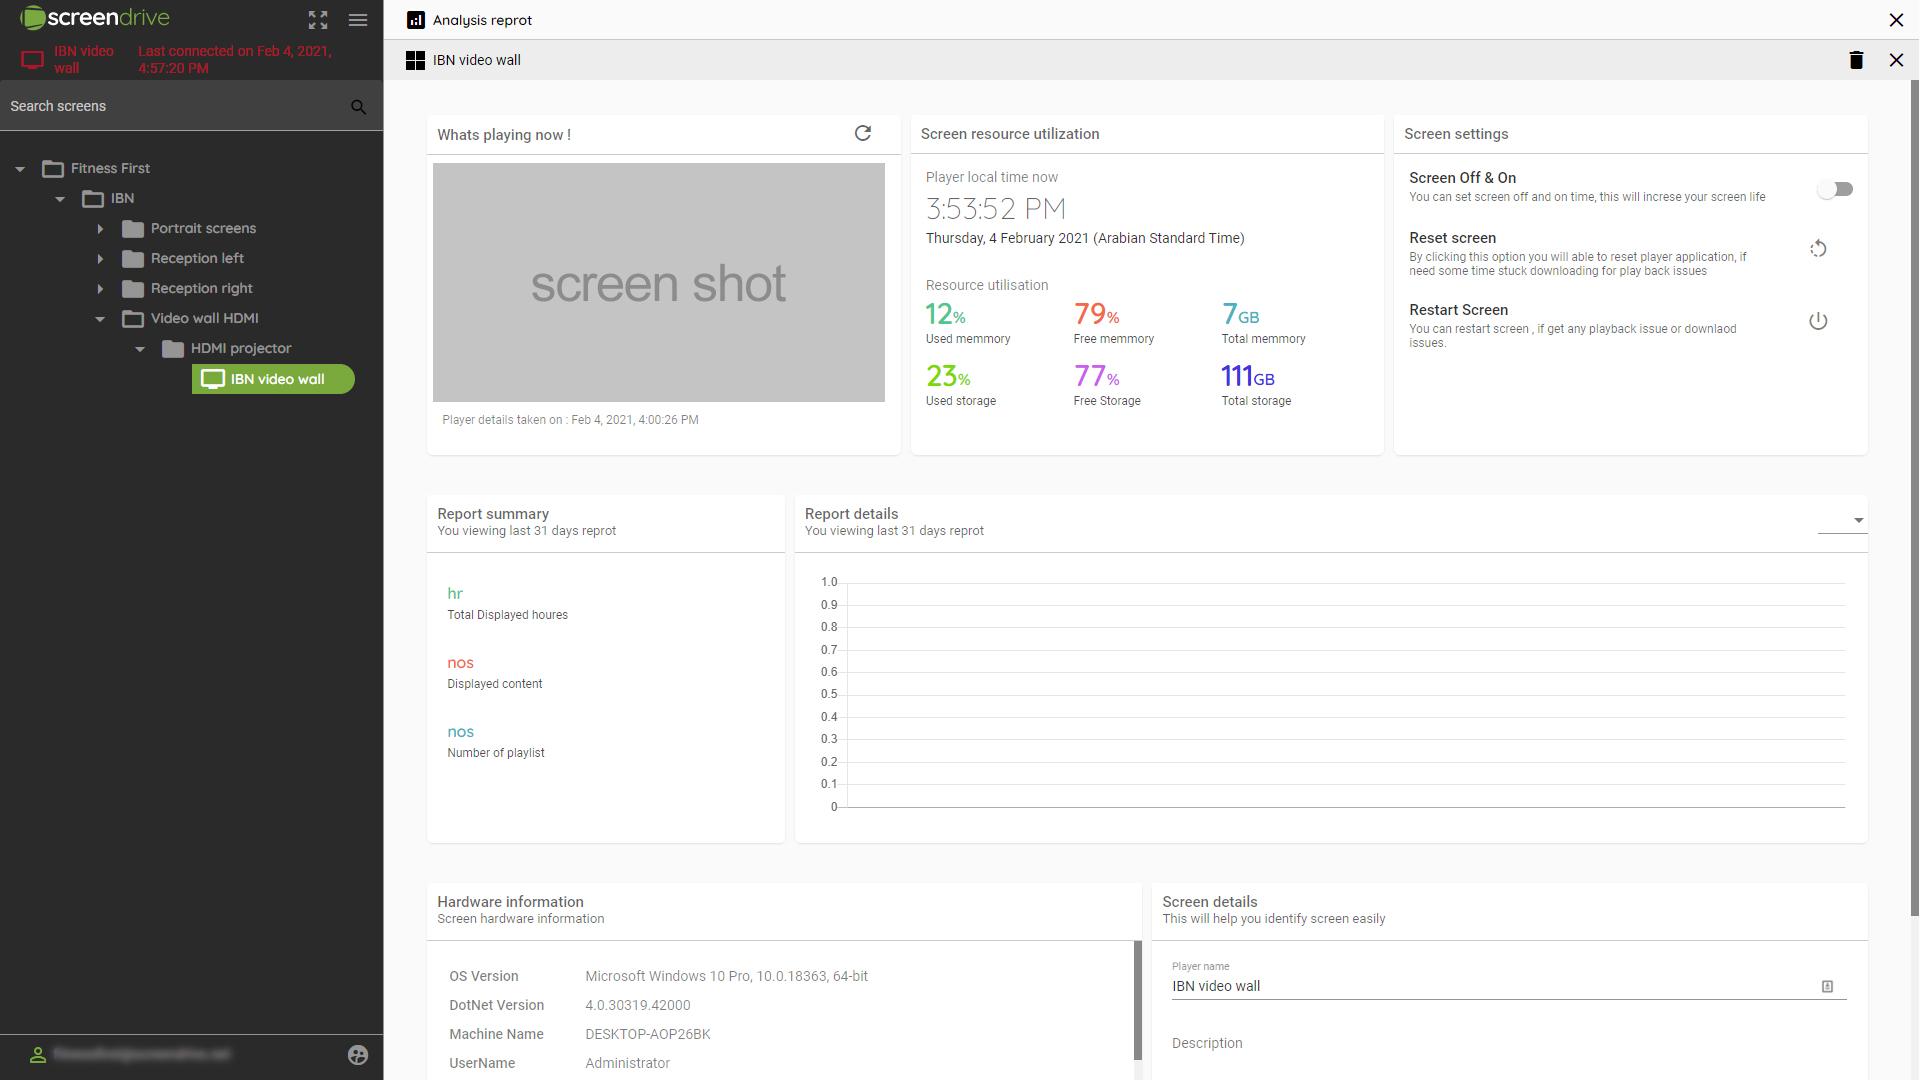 Screendrive screen details